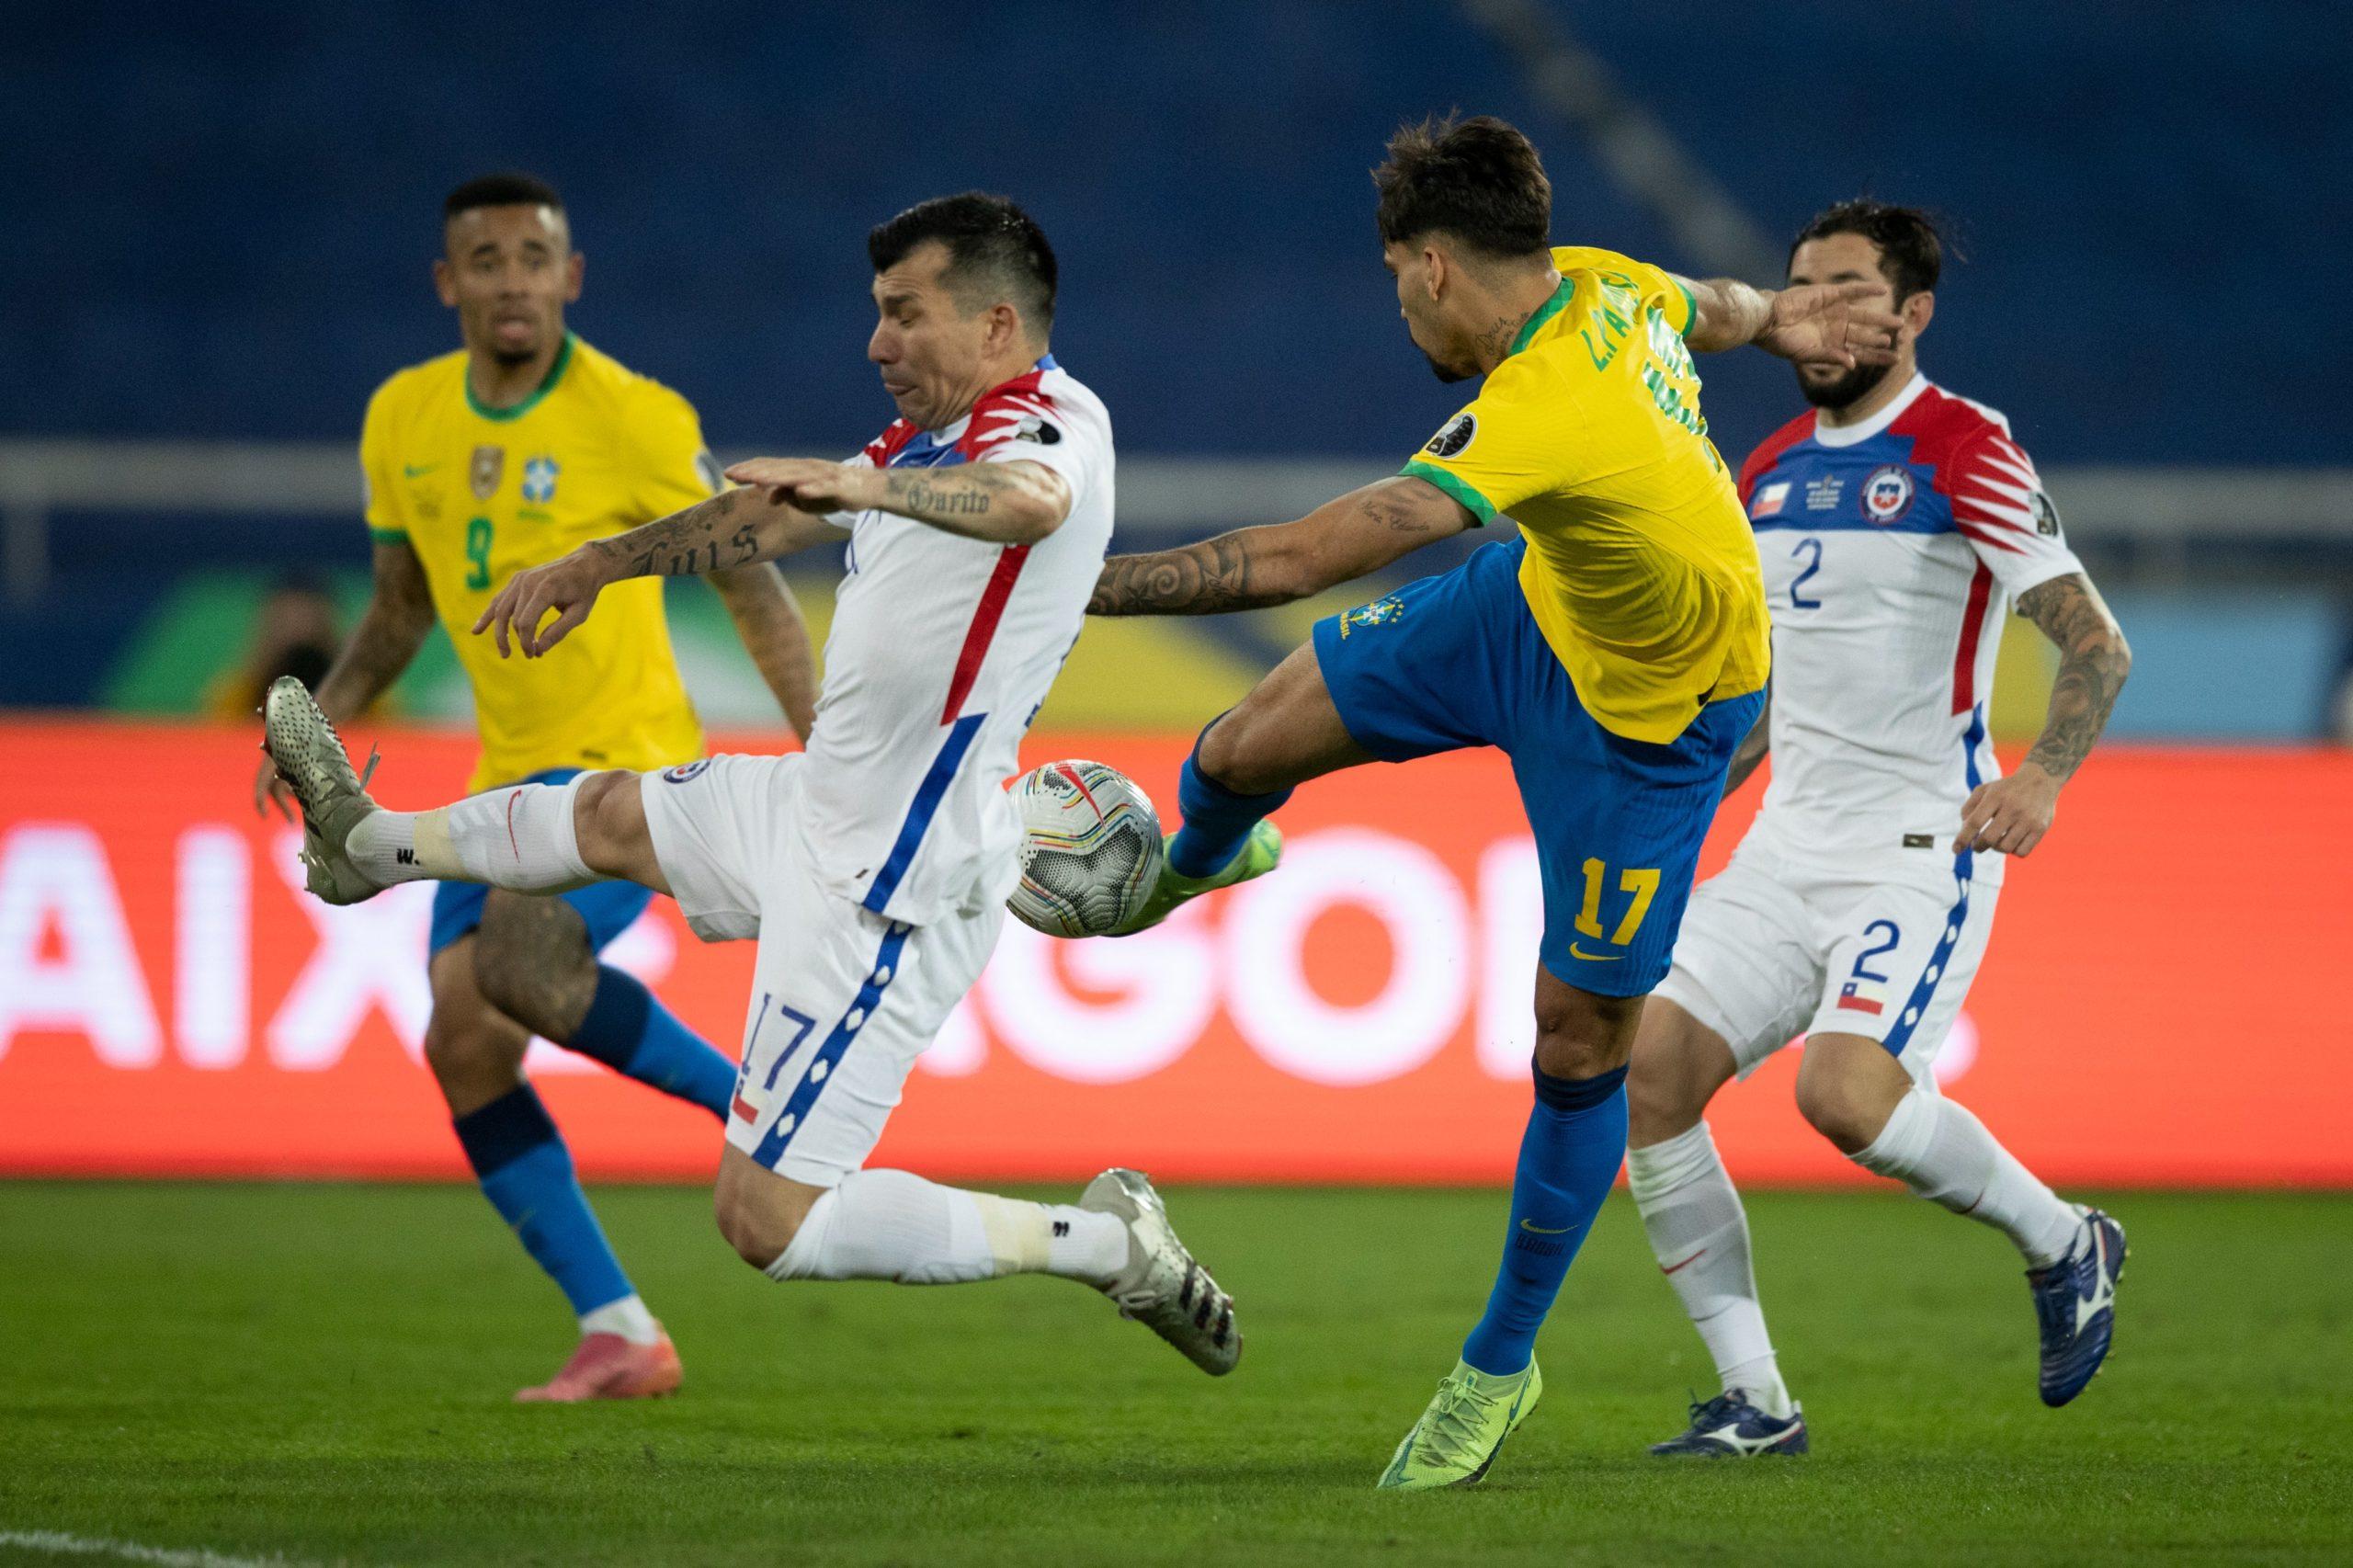 Copa America semifinal fixtures